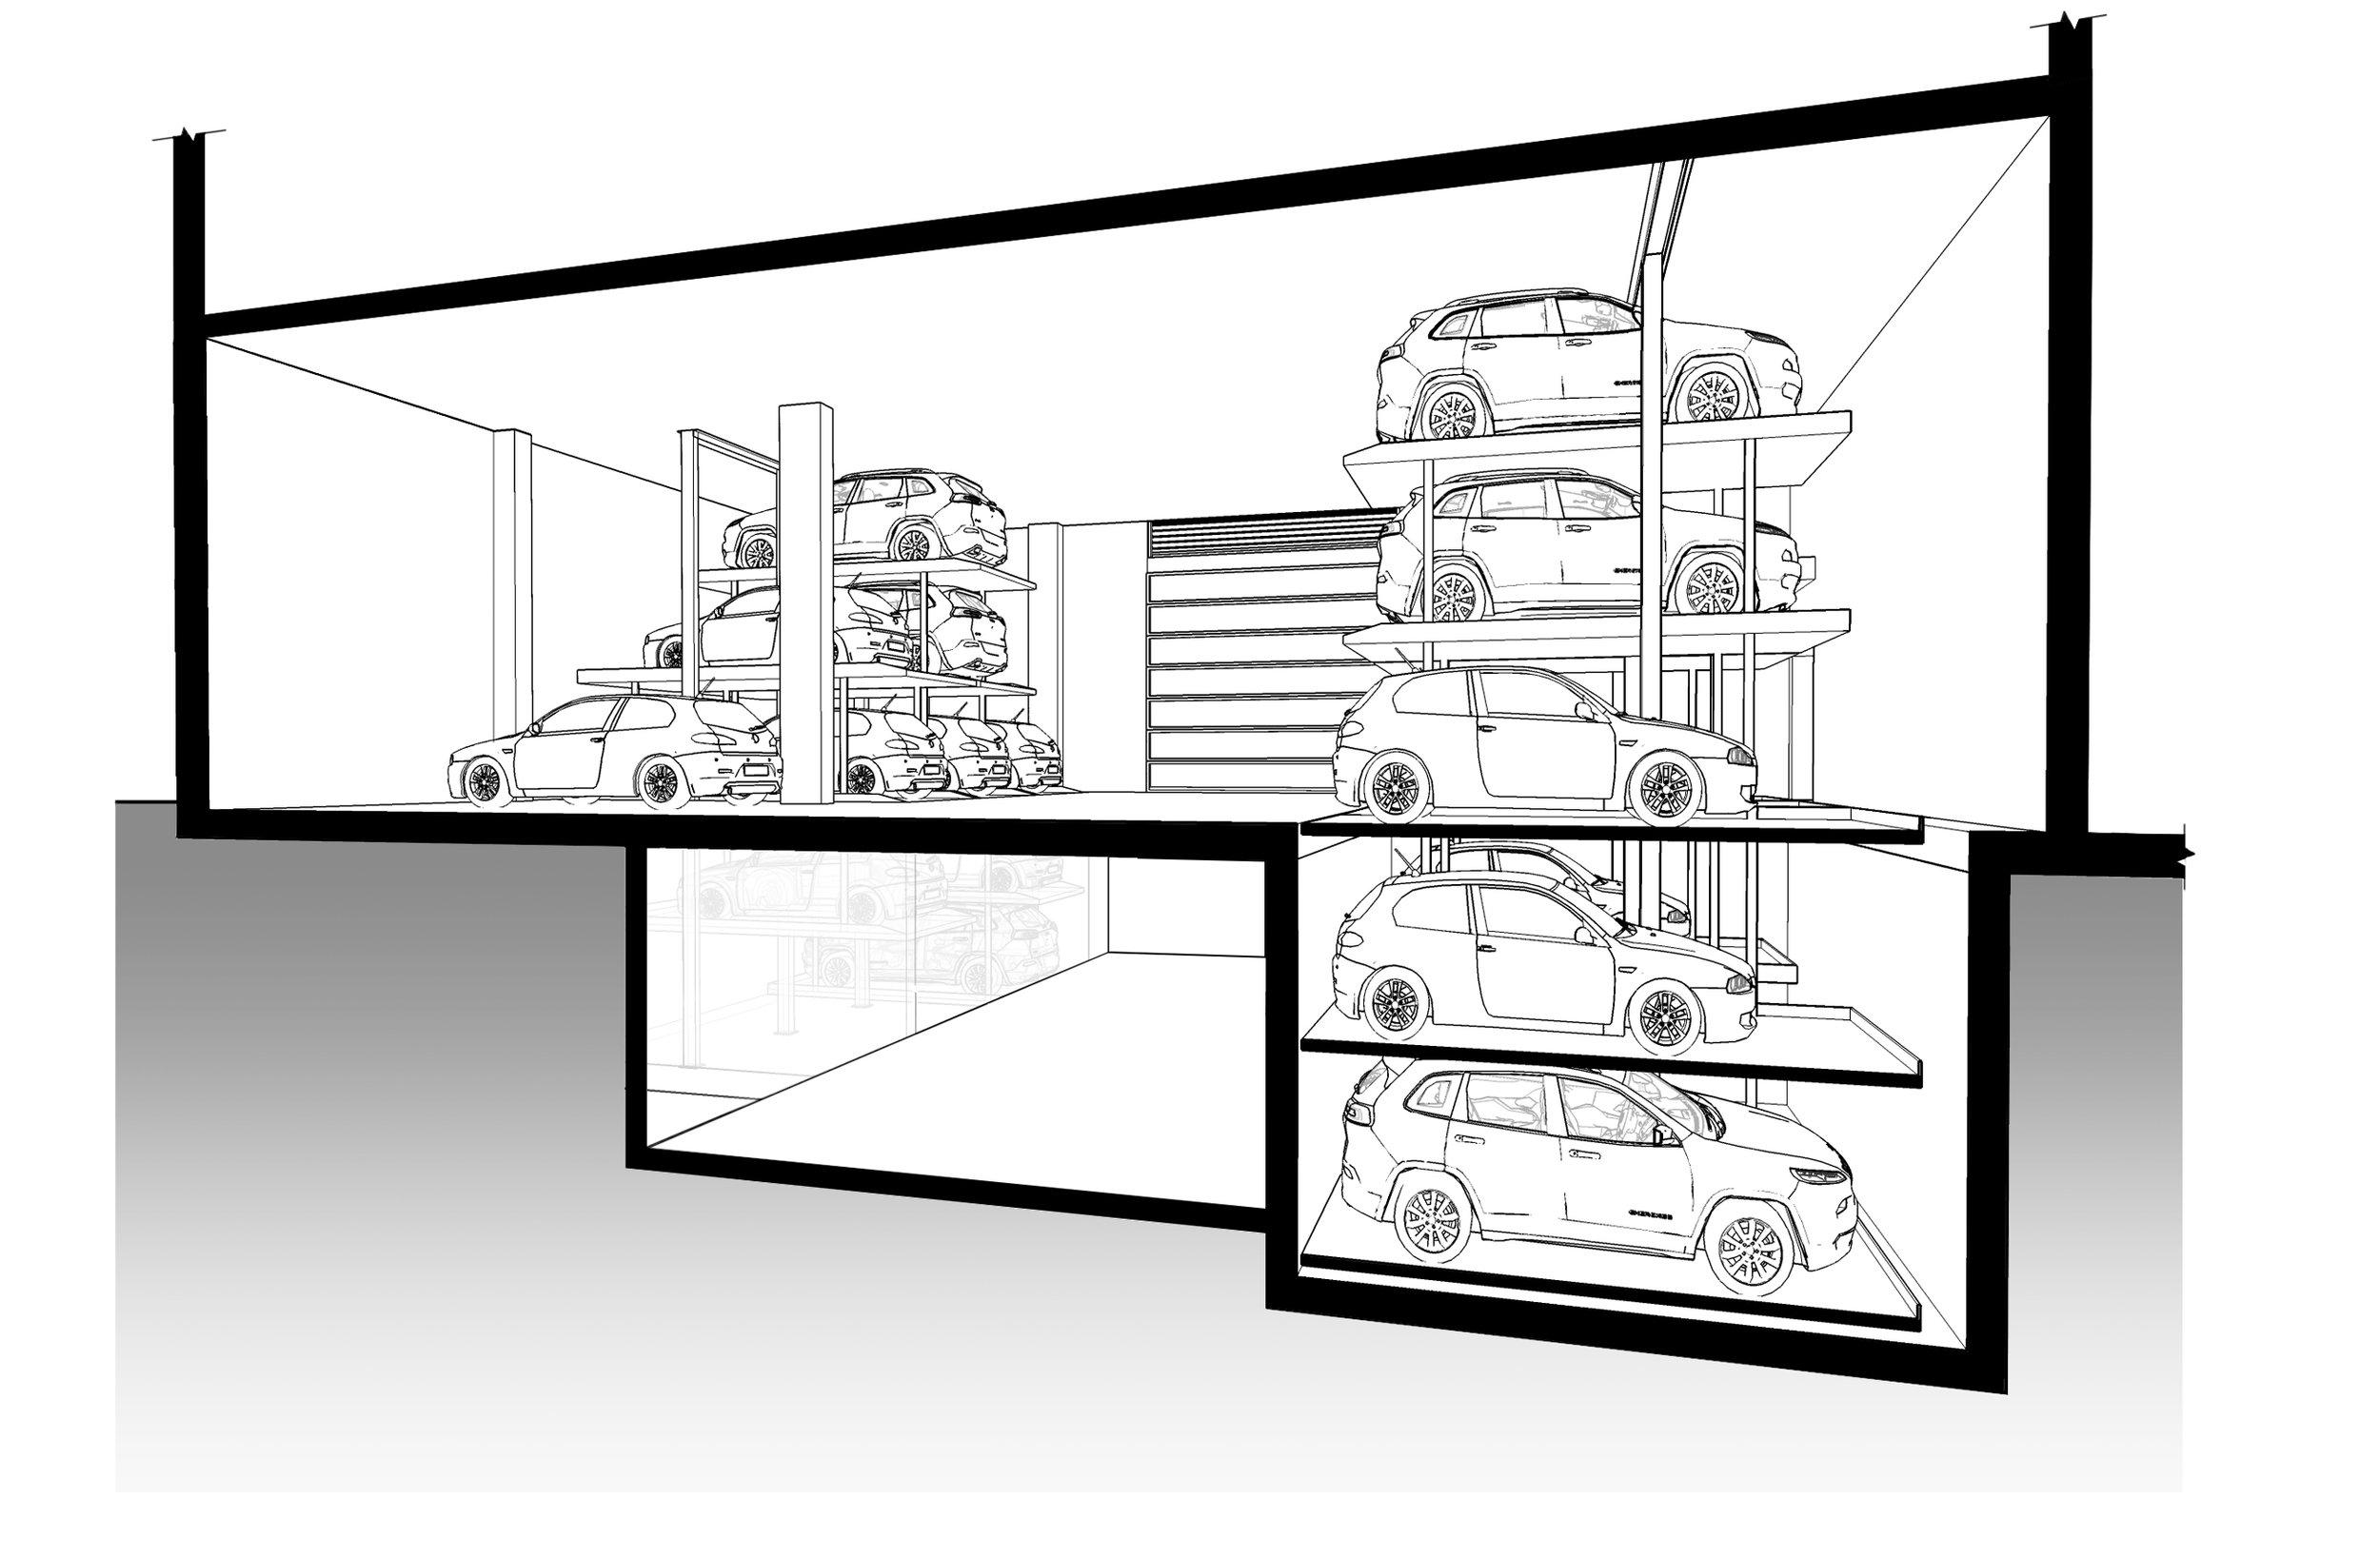 GIS plaza car lift system scheme.jpg